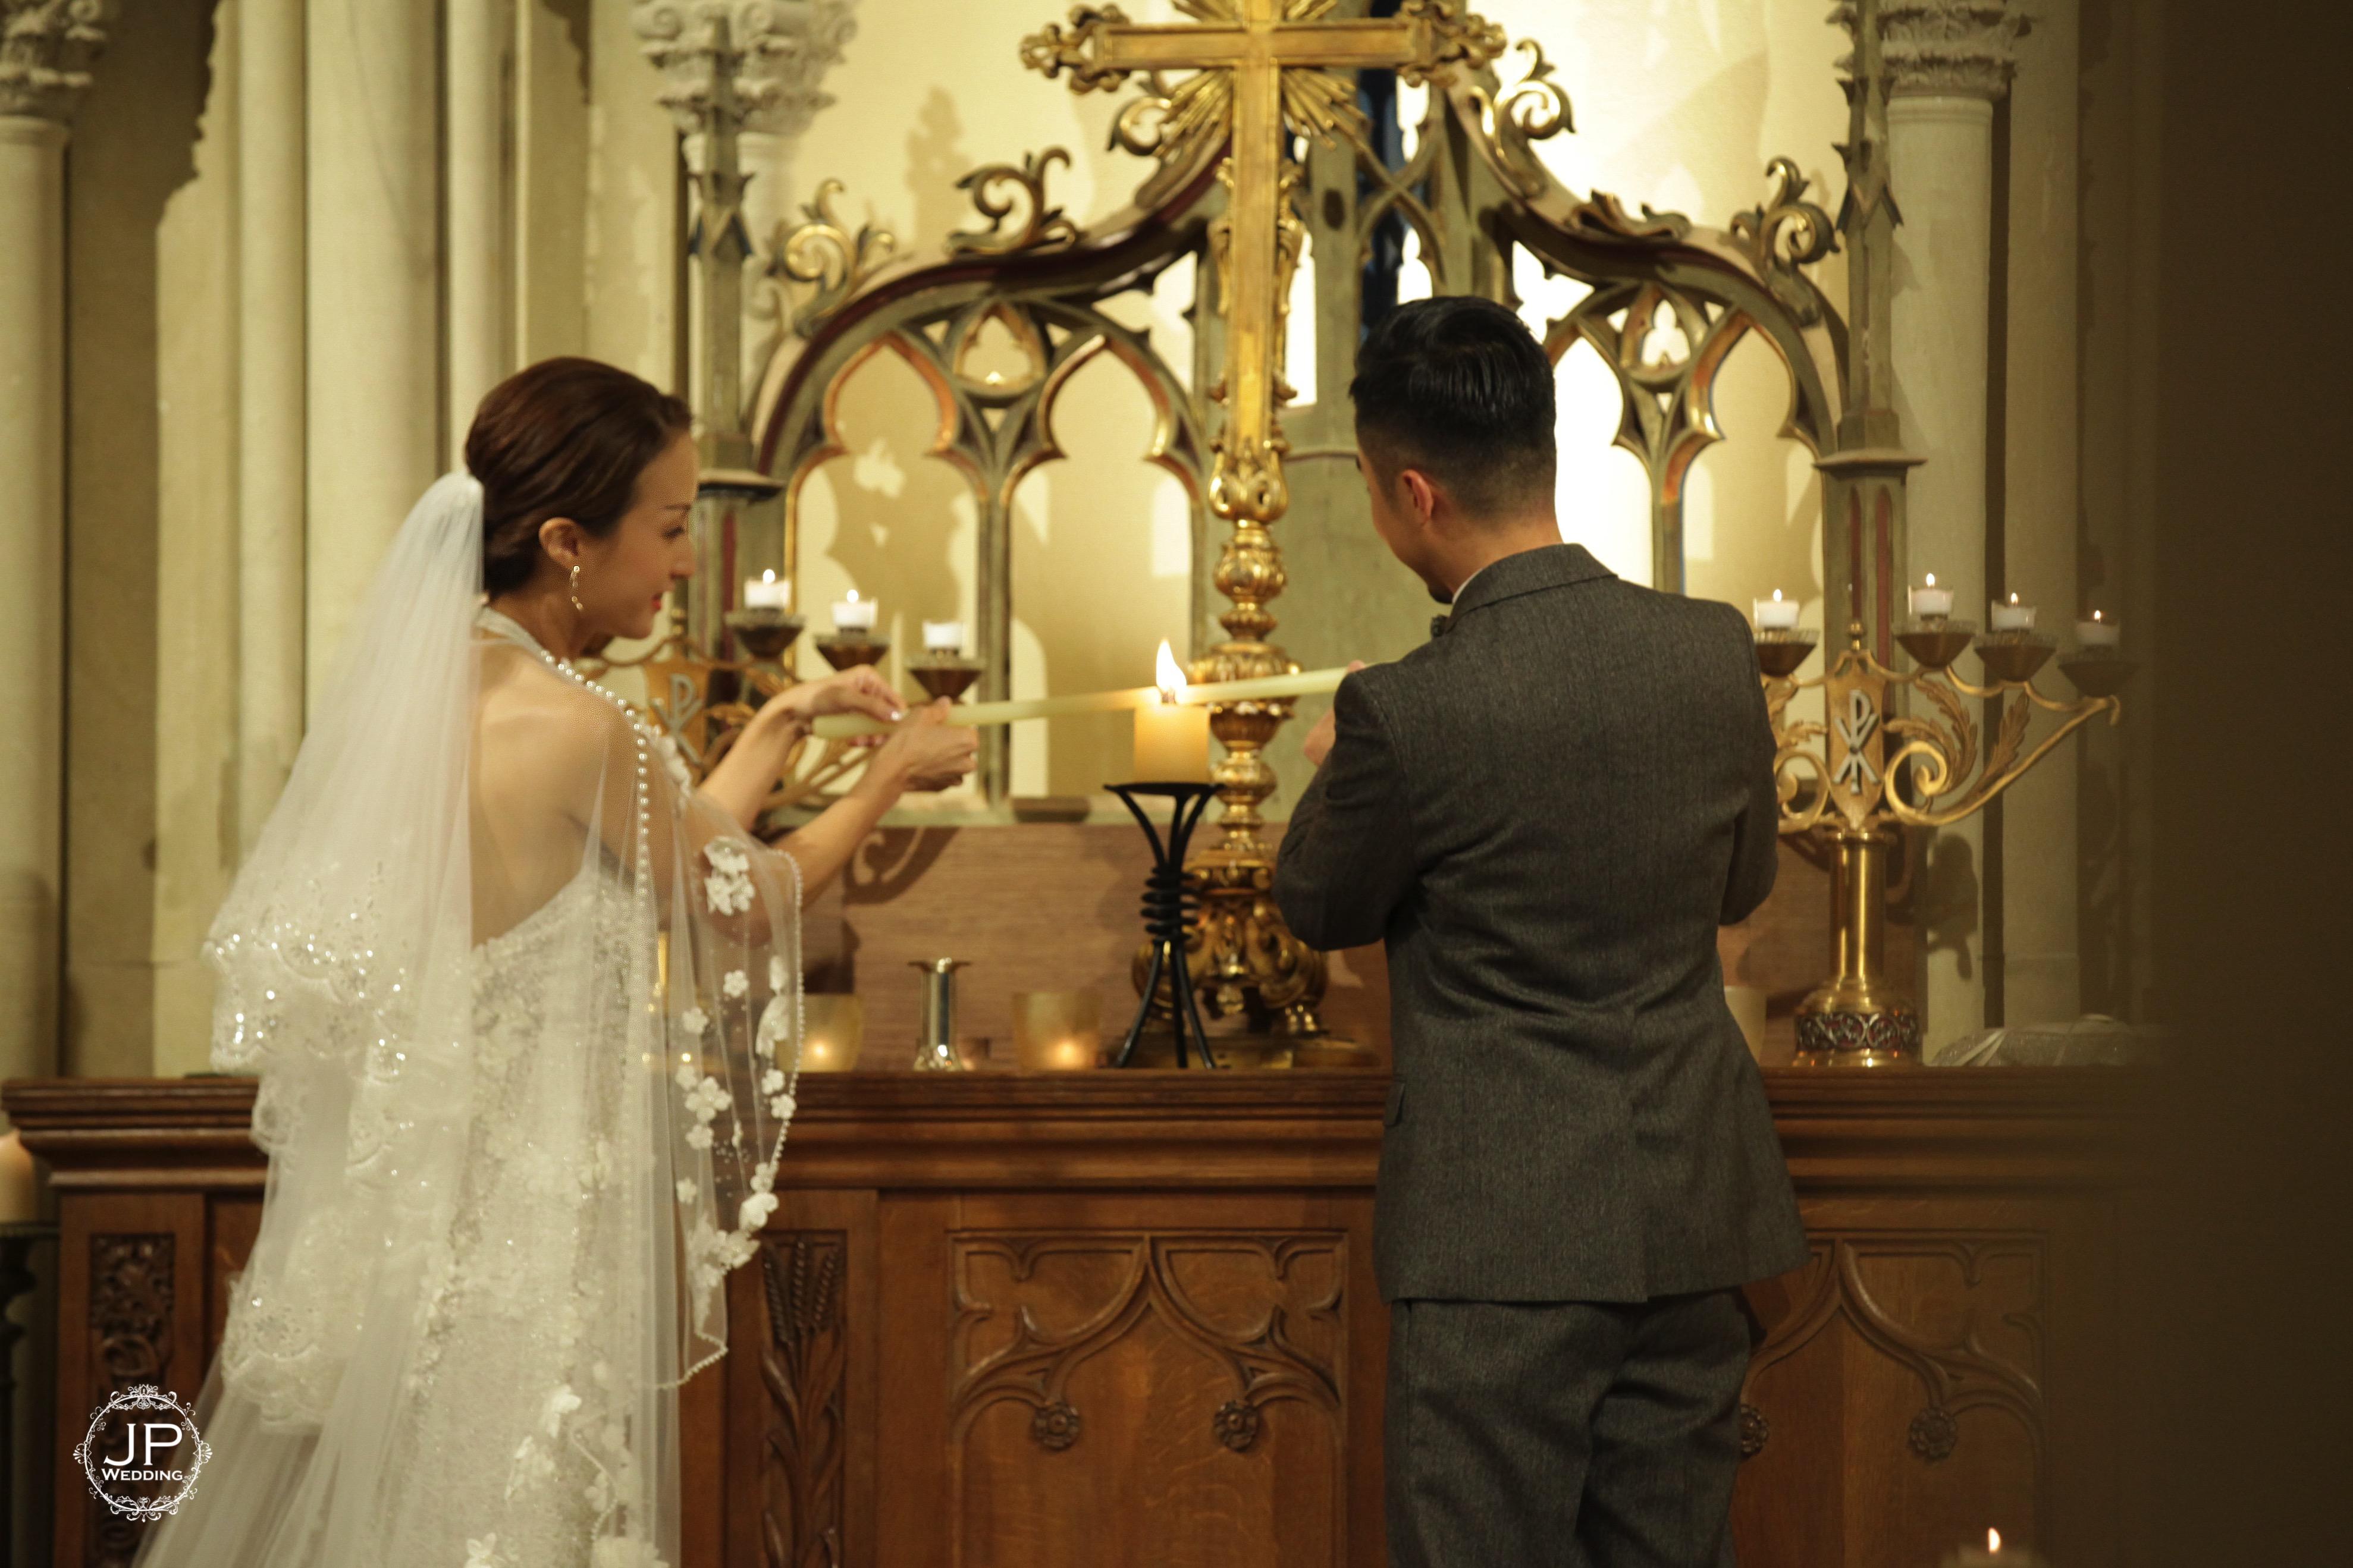 HK. JP Wedding. Heart Court Yokohama-9